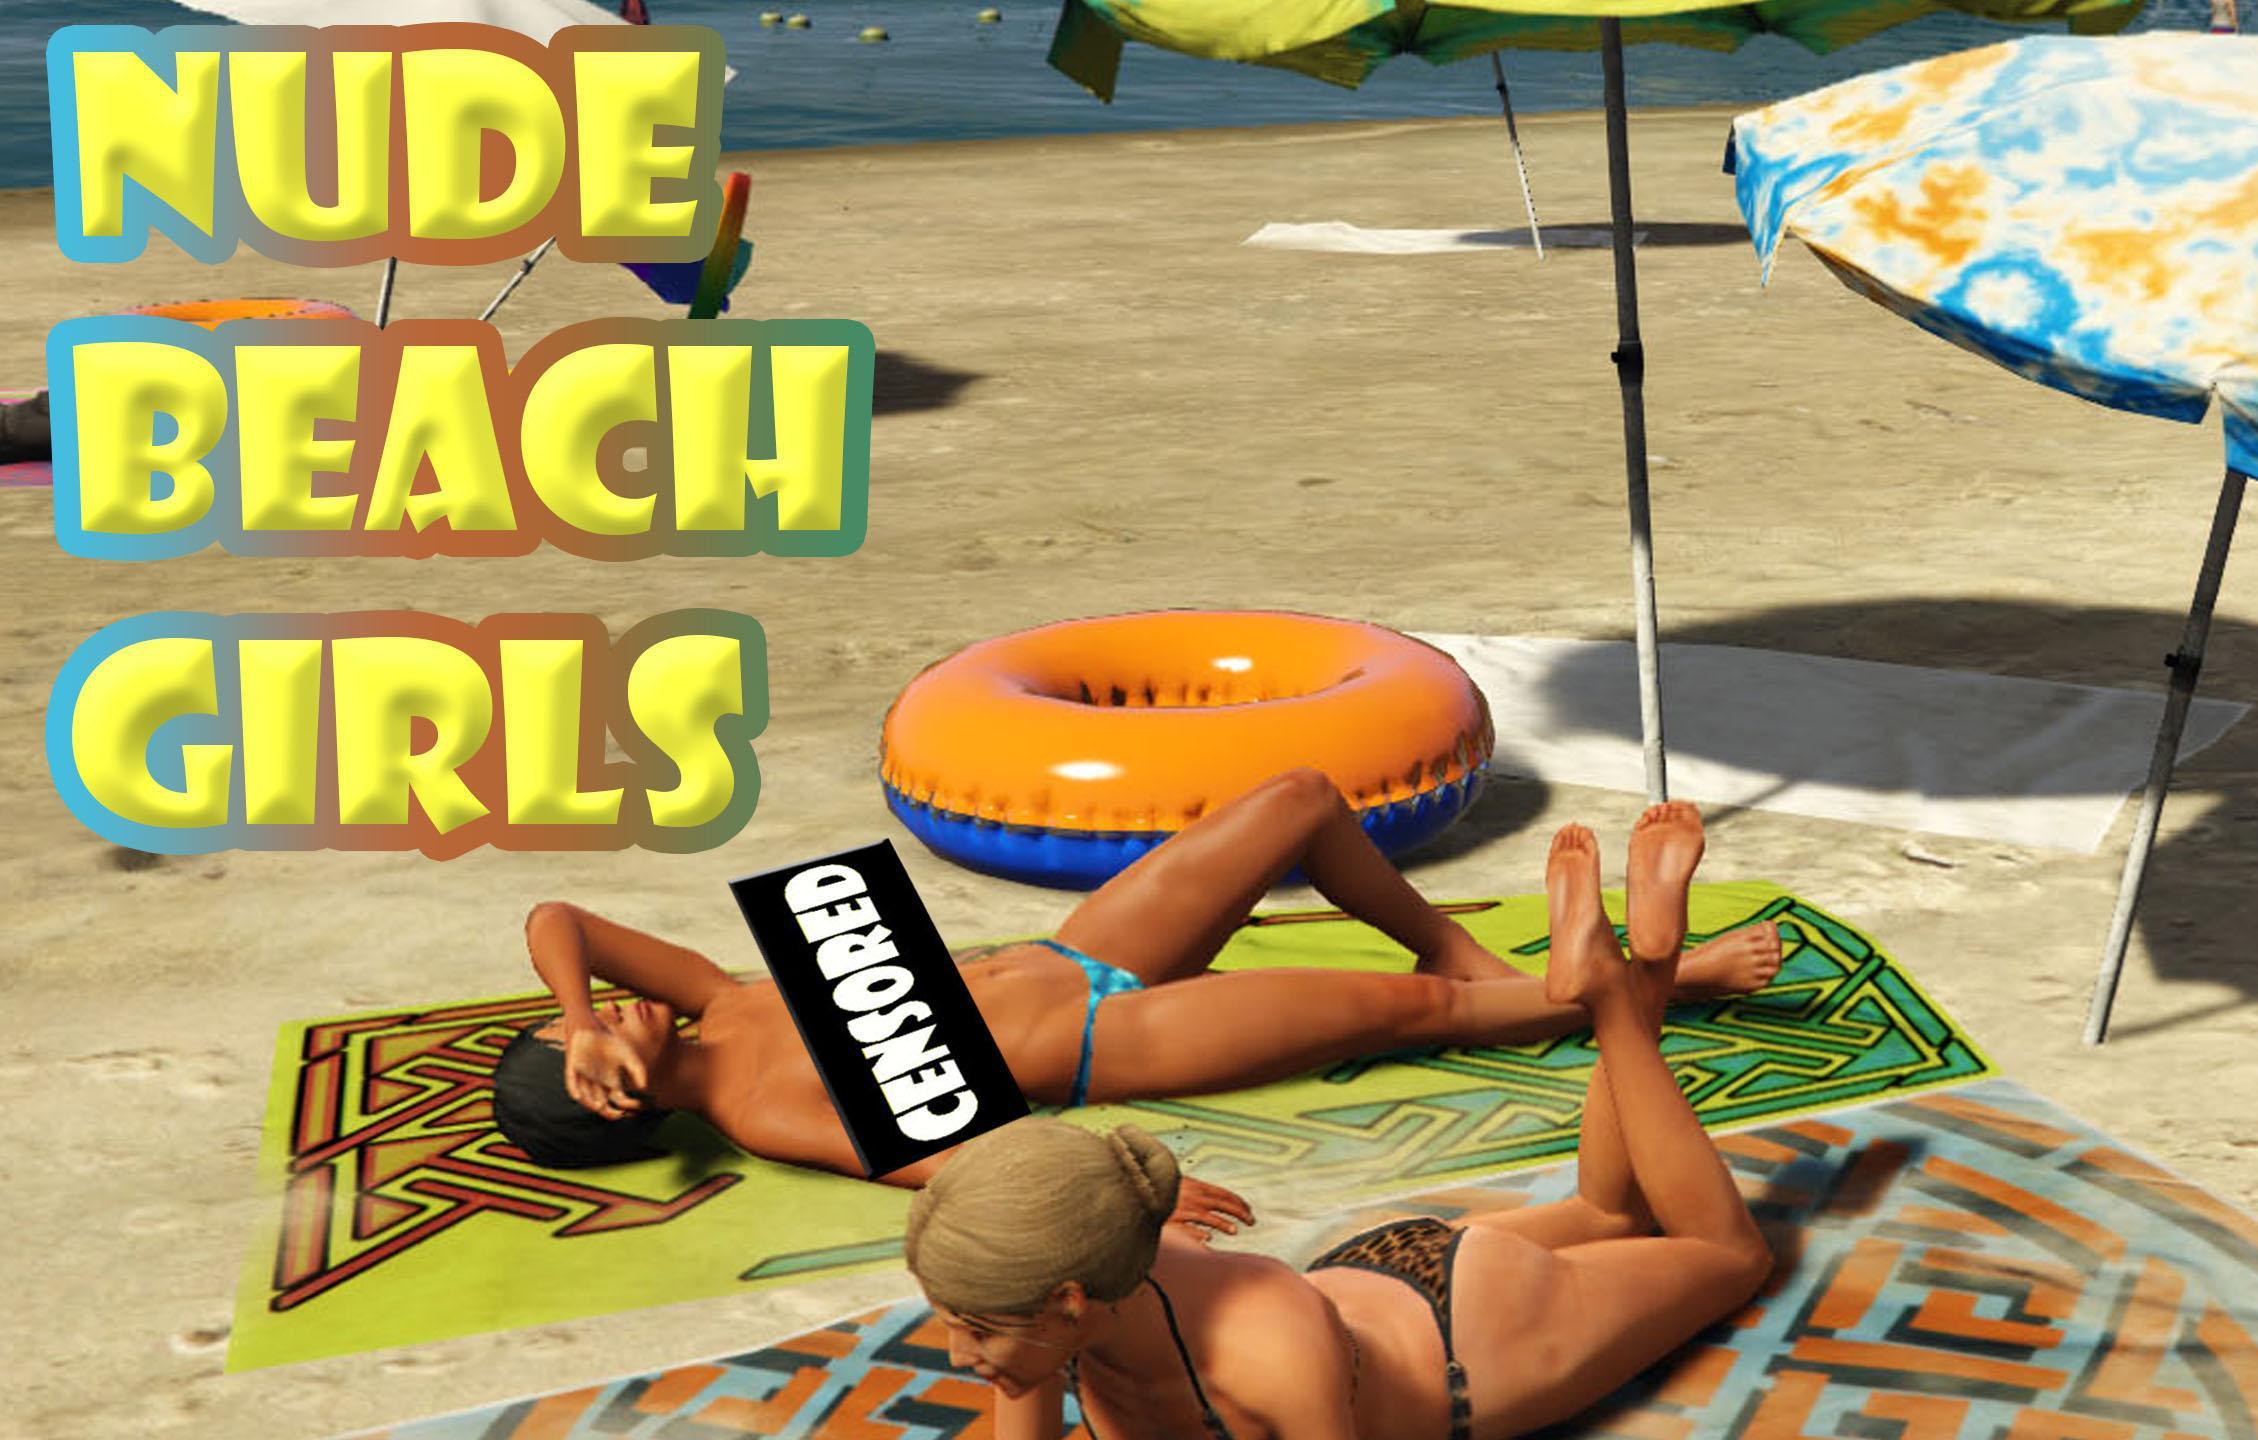 Nude Beach Girls 18 - Gta5-Modscom-6847